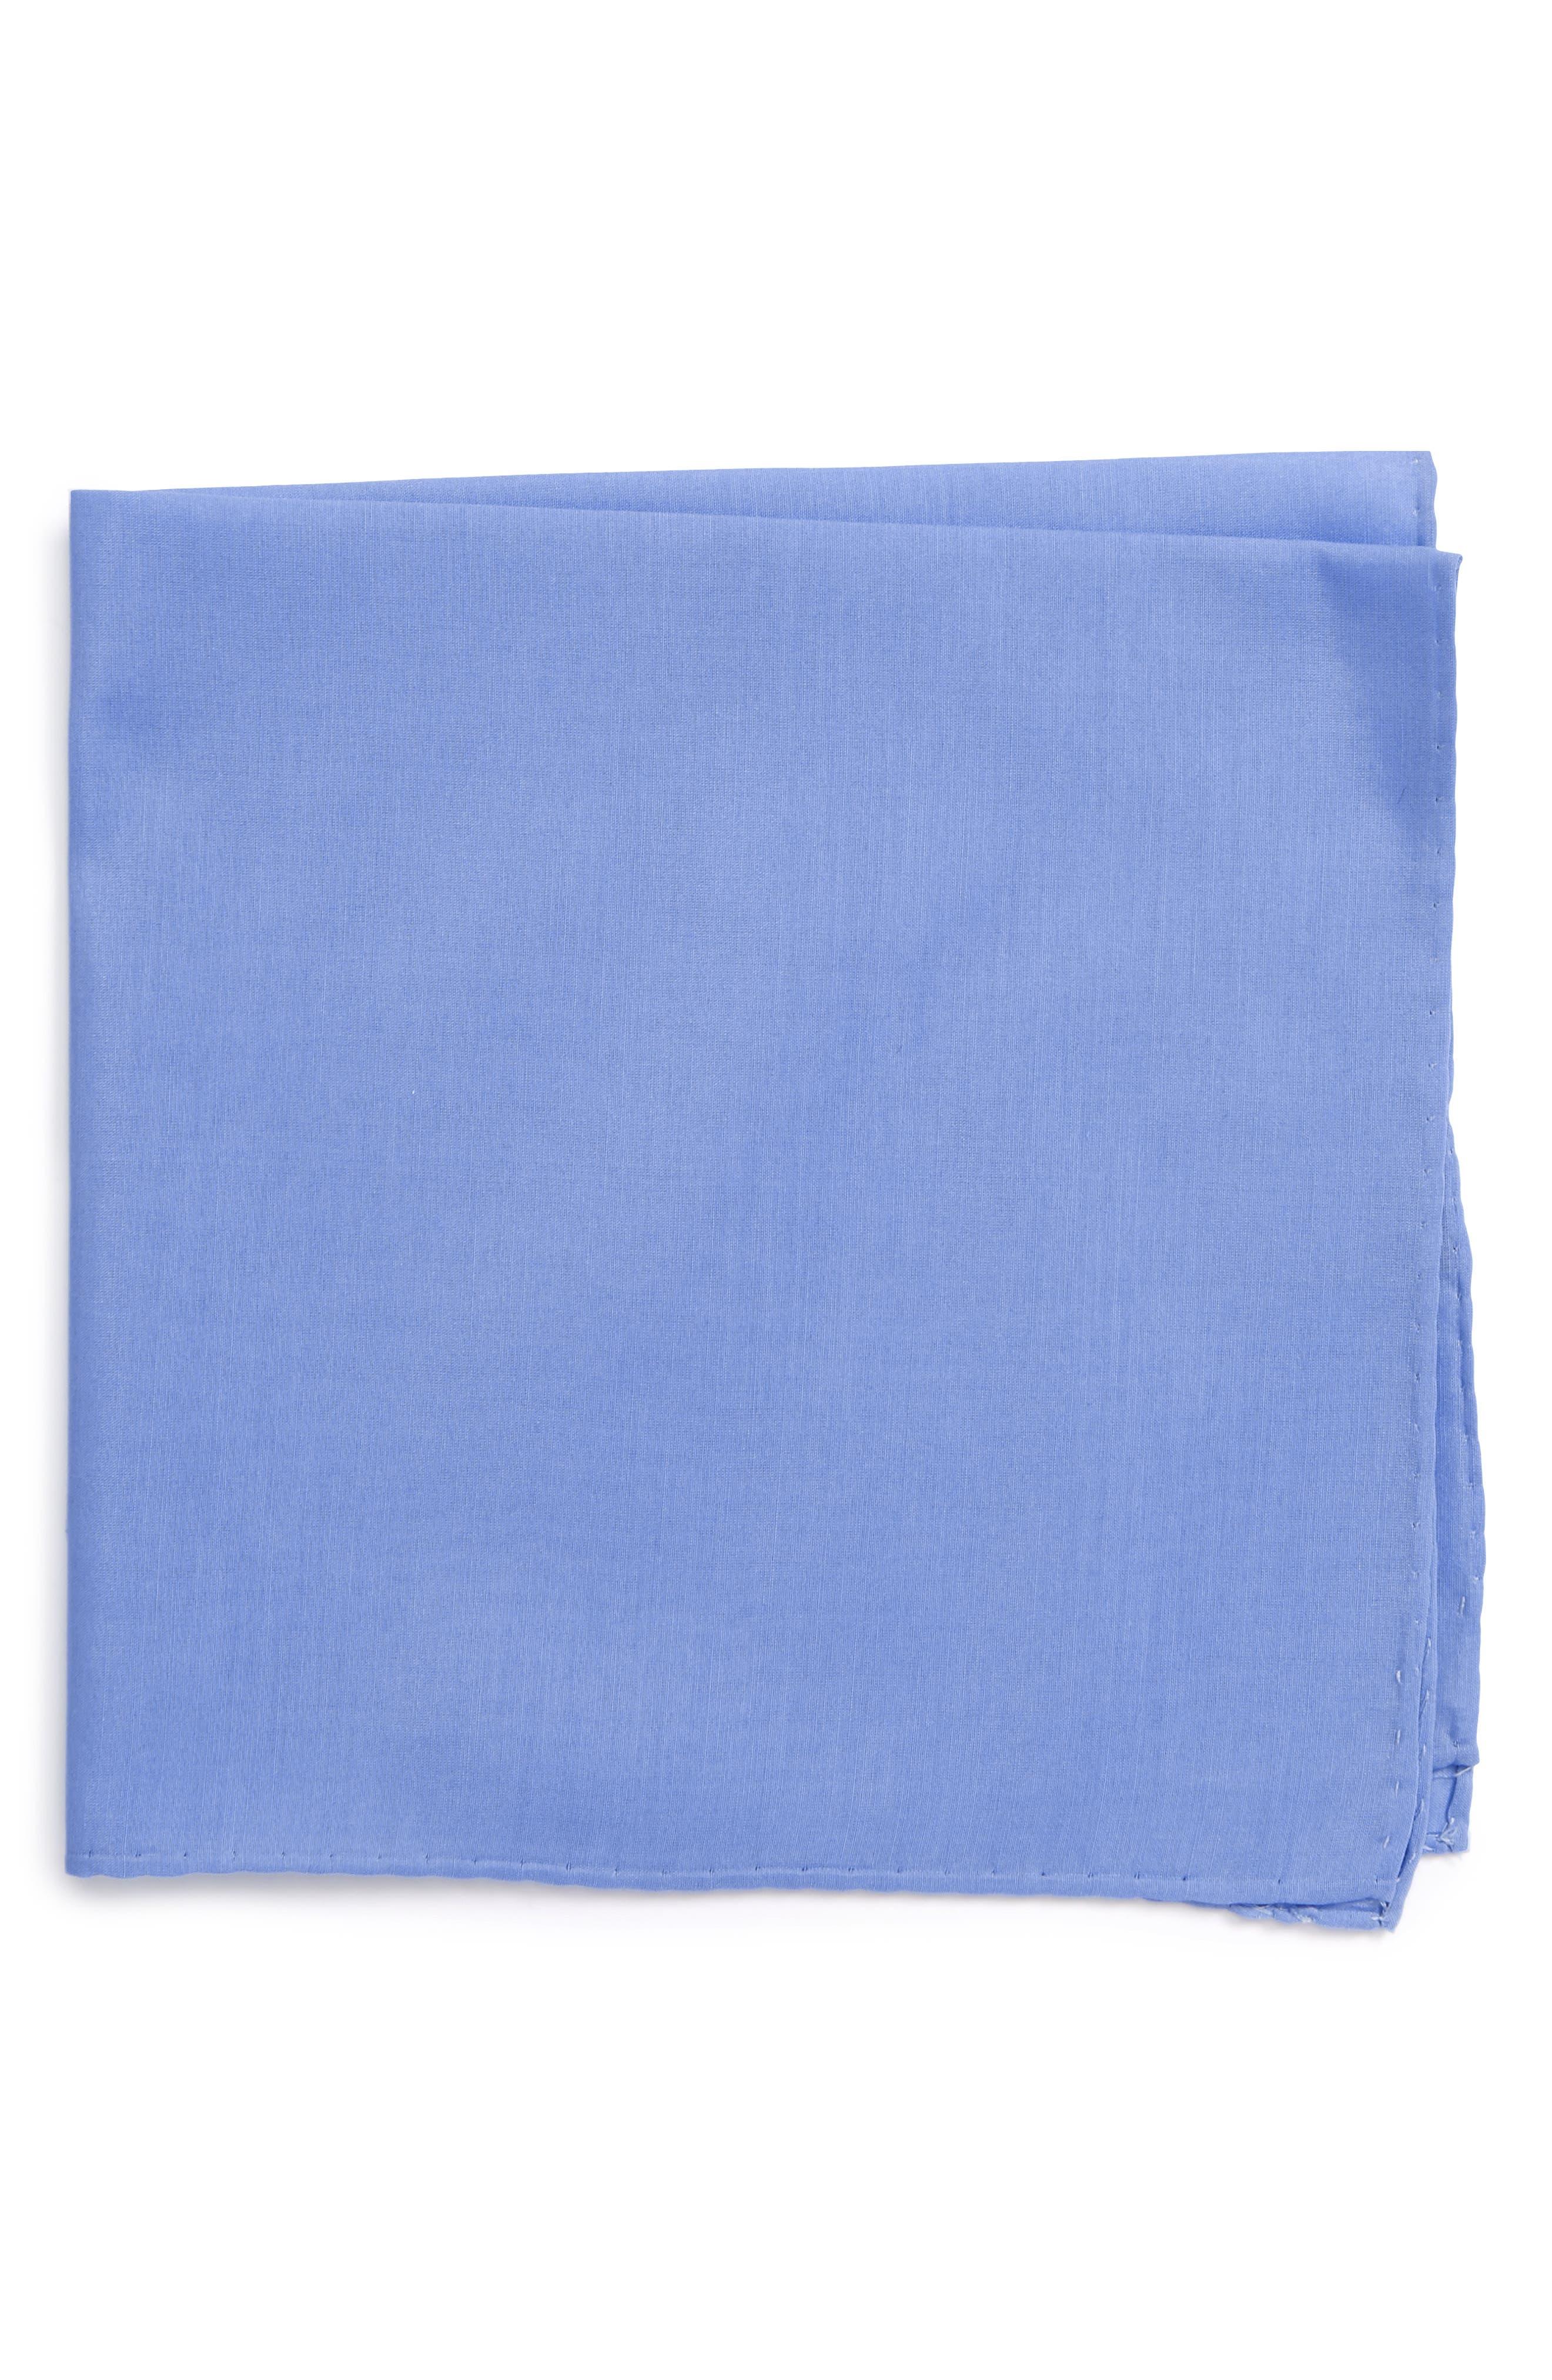 Main Image - Nordstrom Men's Shop Solid Cotton & Silk Pocket Square